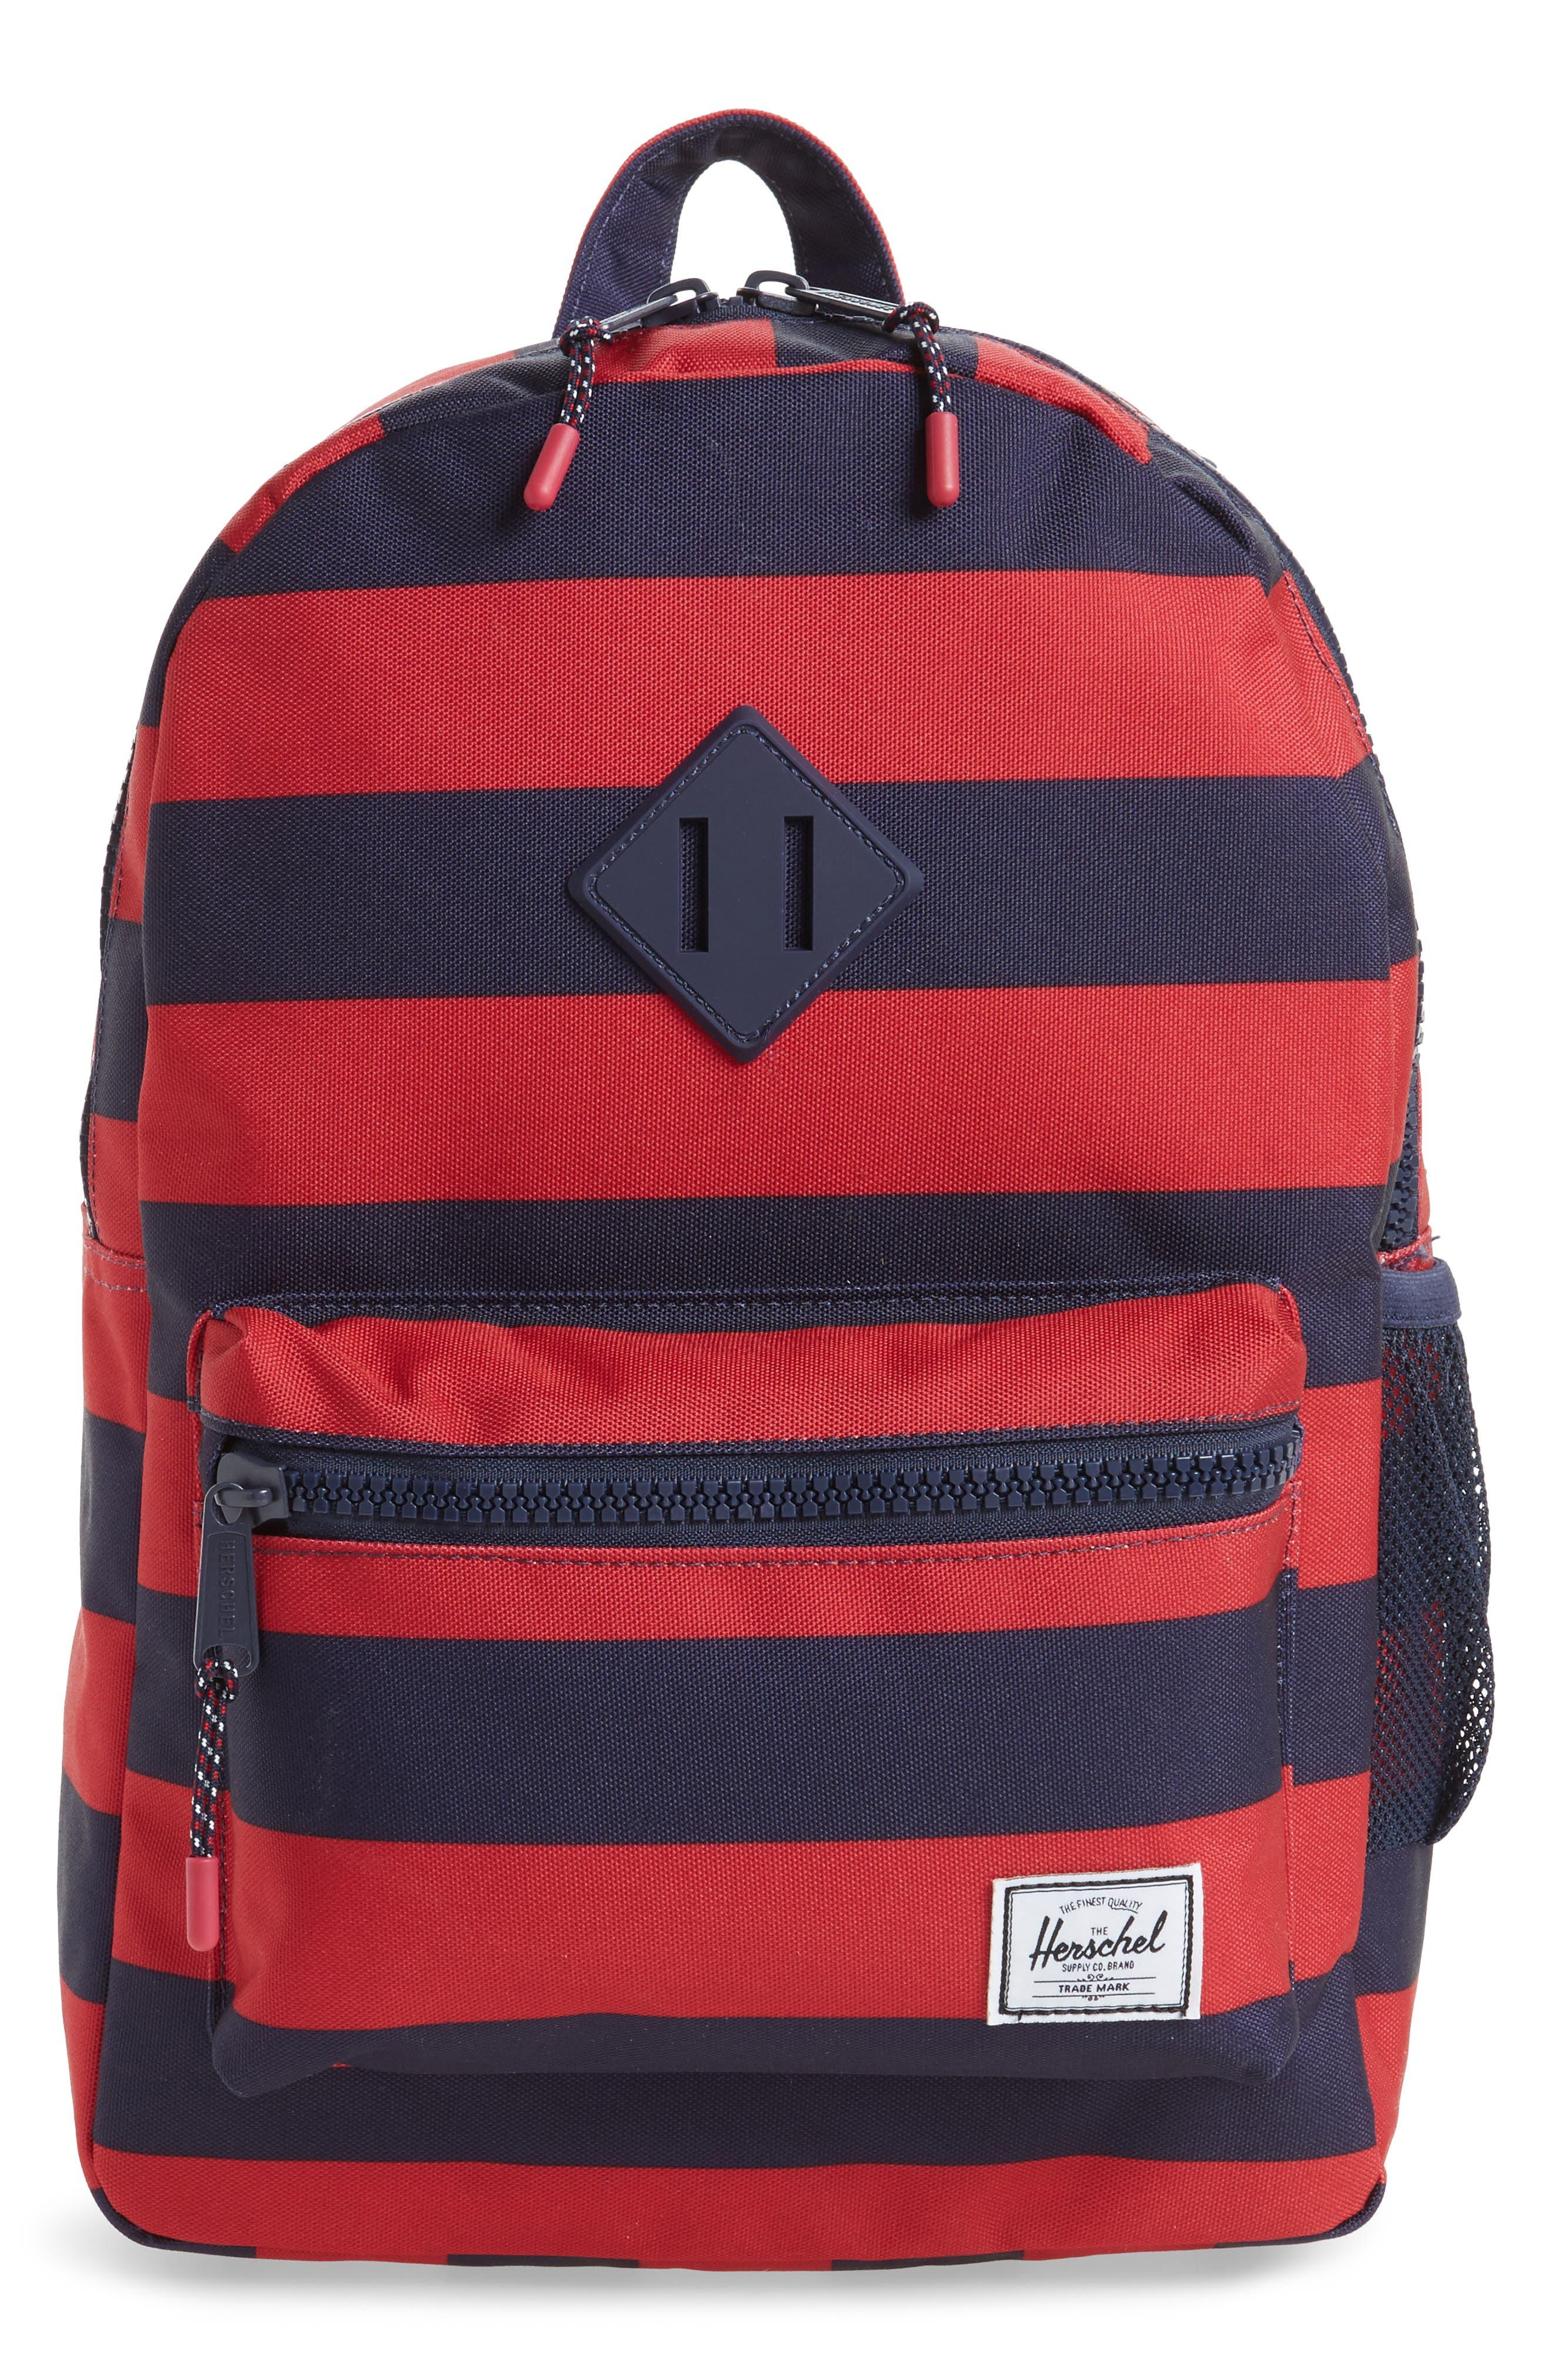 Alternate Image 1 Selected - Herschel Supply Co. Heritage Stripe Backpack (Kids)